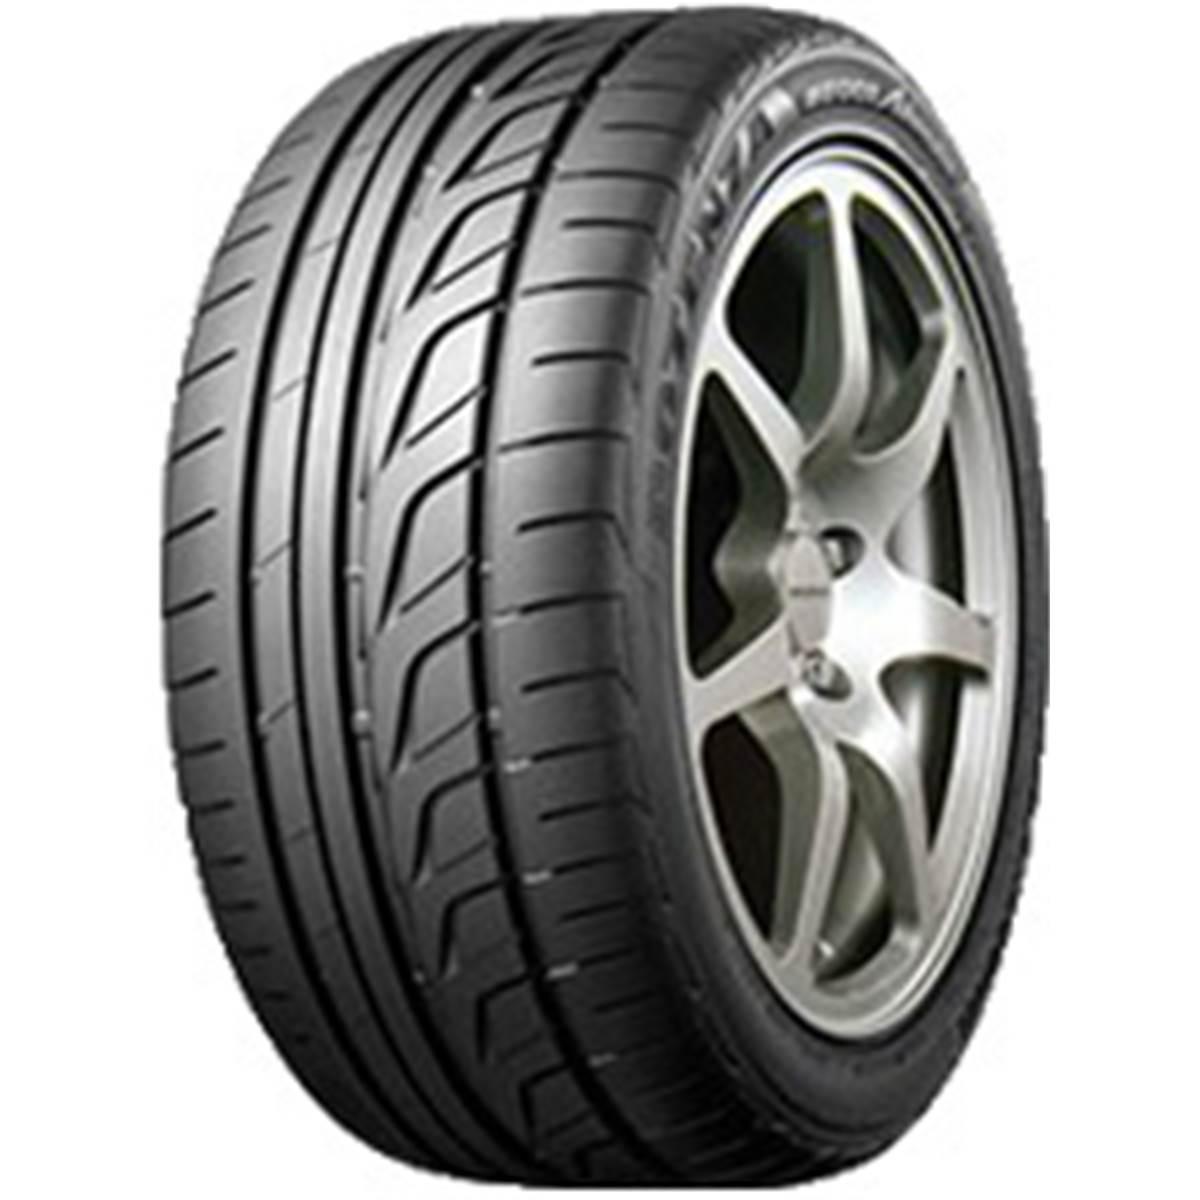 Pneu Bridgestone 225/55R16 95W POTENZA ADRENALIN RE002